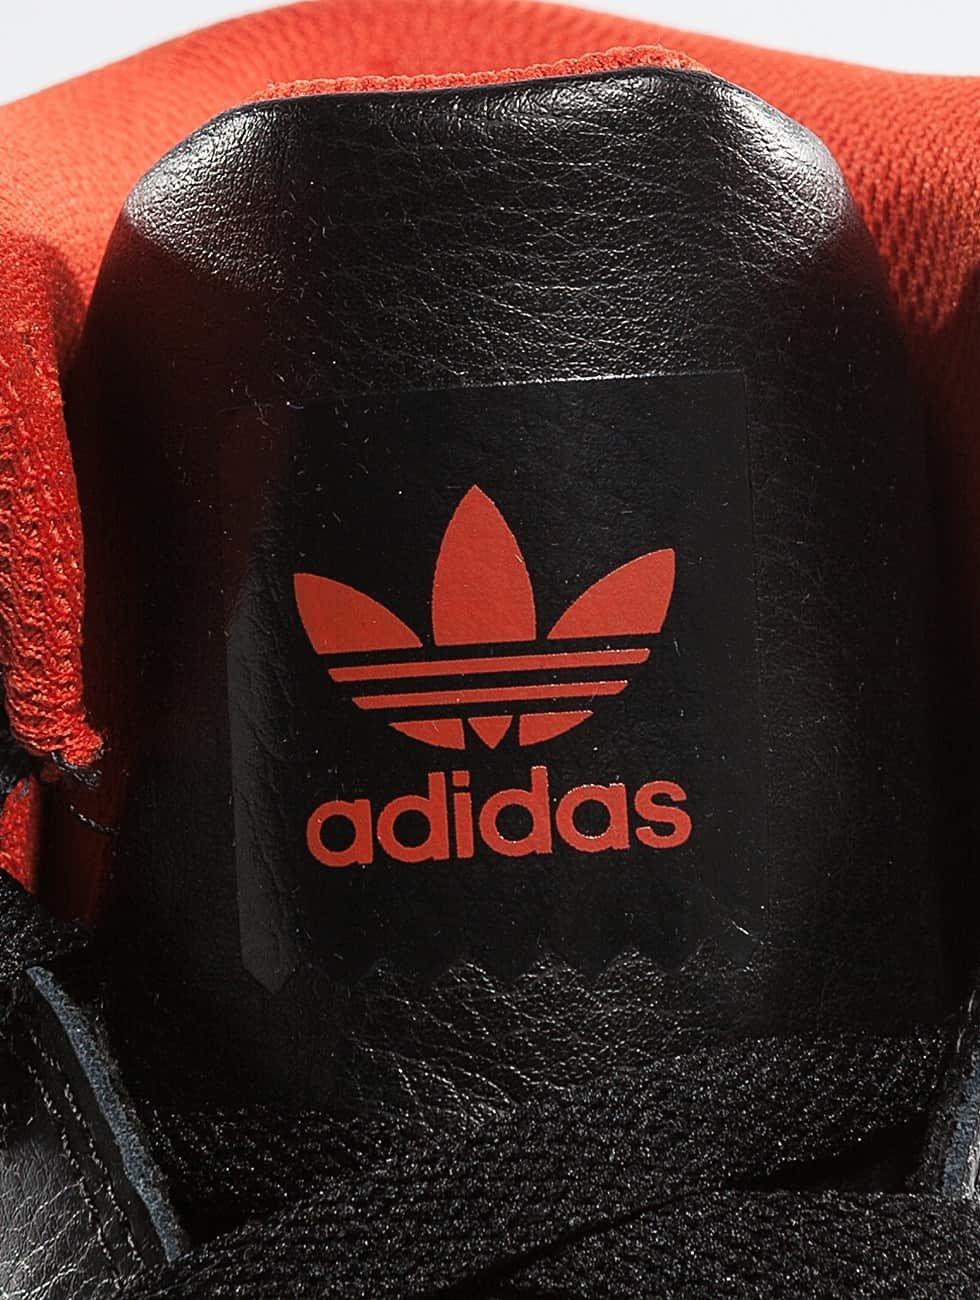 Adidas Originals Scarpa / Sneaker Mid Varial Nero 370512 jjHrV